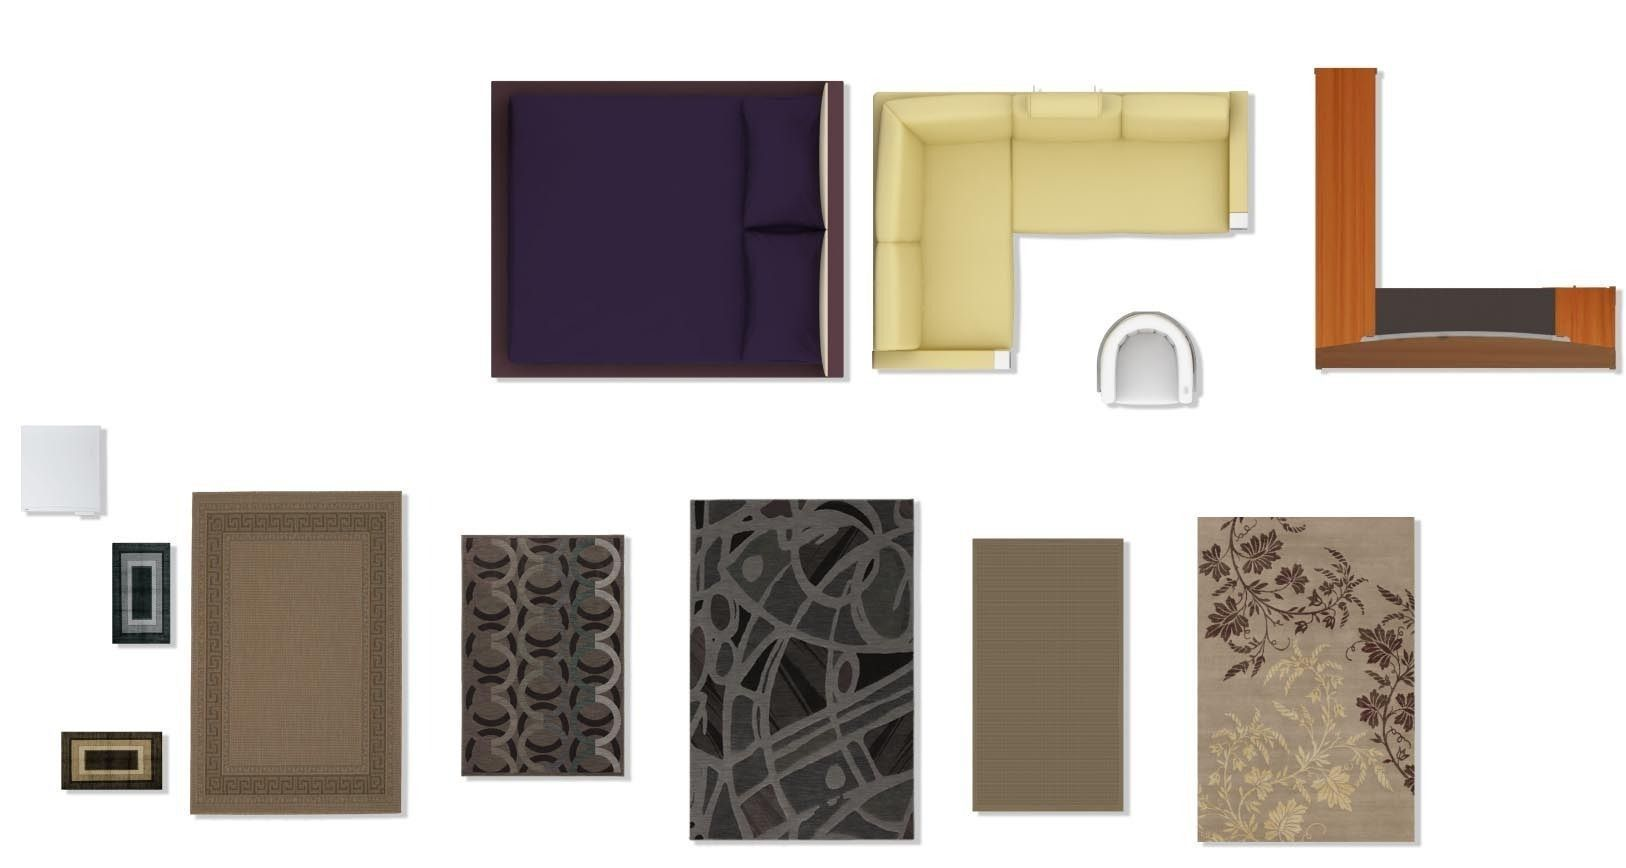 photoshop room templates - psd 2d floorplan furniture 3d model 2d top down game